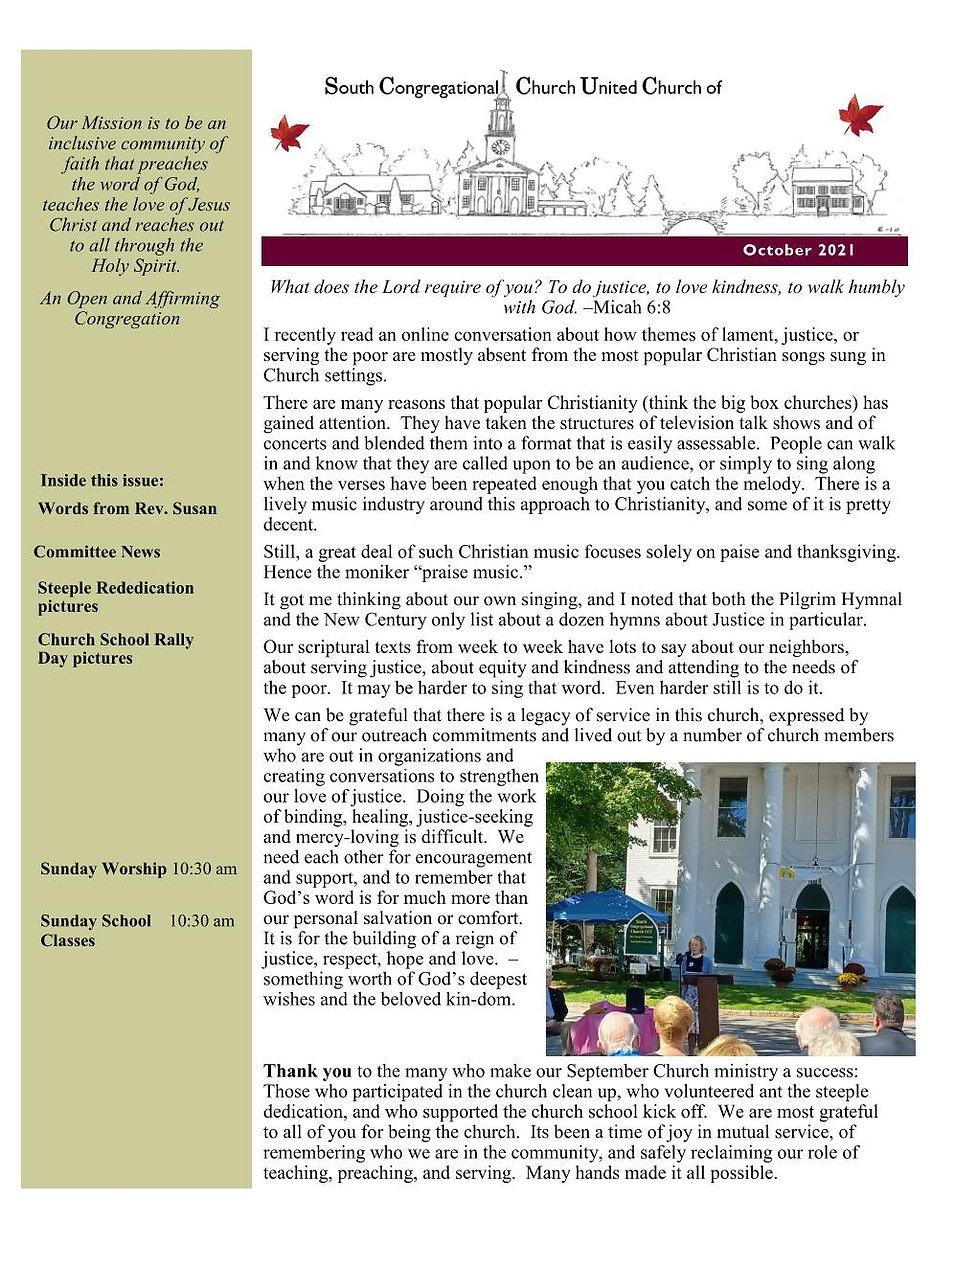 October 2021 Page 001.jpg